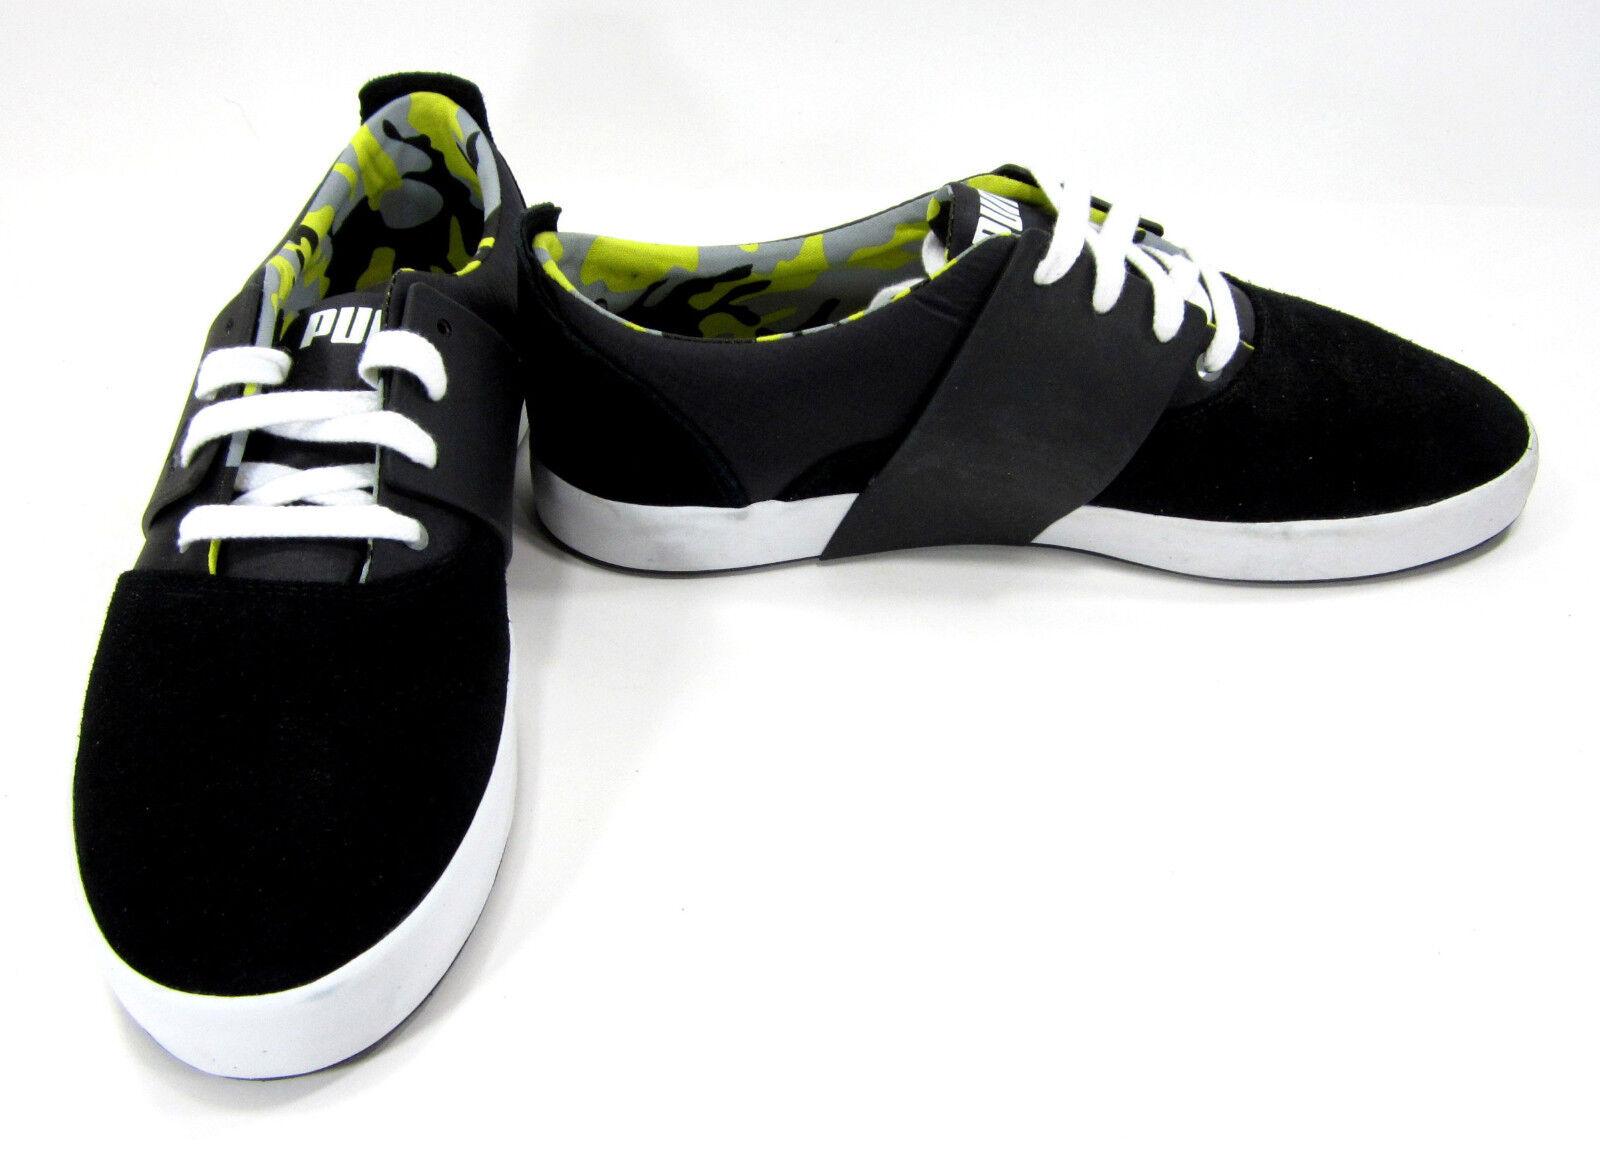 Puma Shoes El Ace 3 City Suede Black/White Sneakers Comfortable